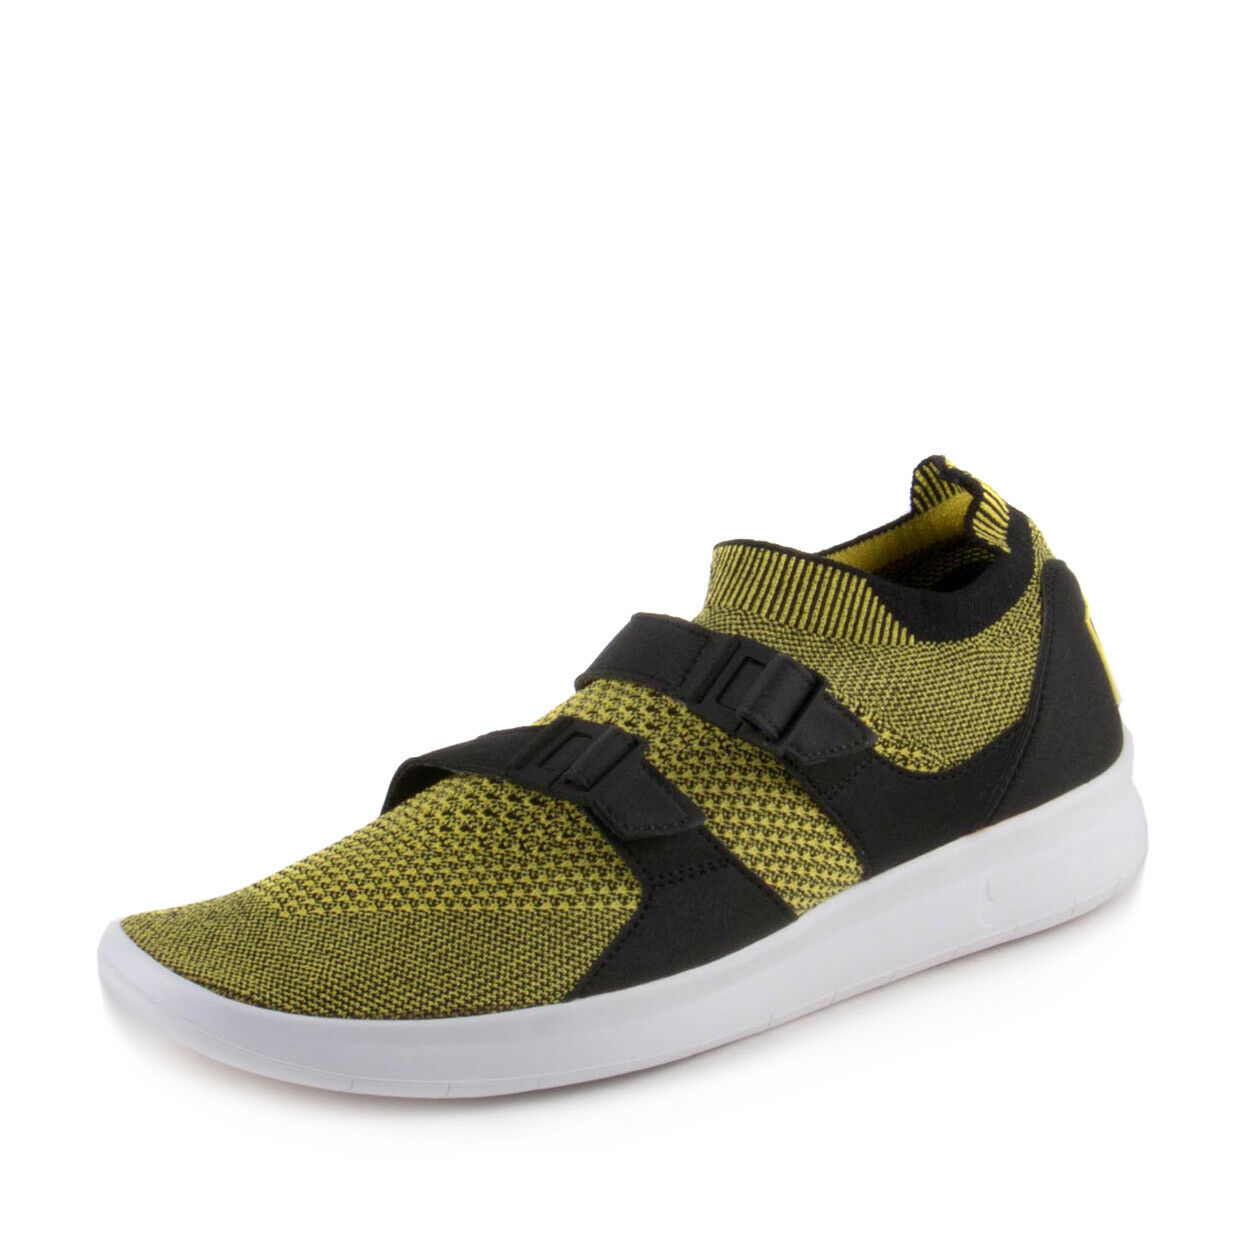 Nike Mens Air Sockracer Flyknit Yellow Strike 898022-700